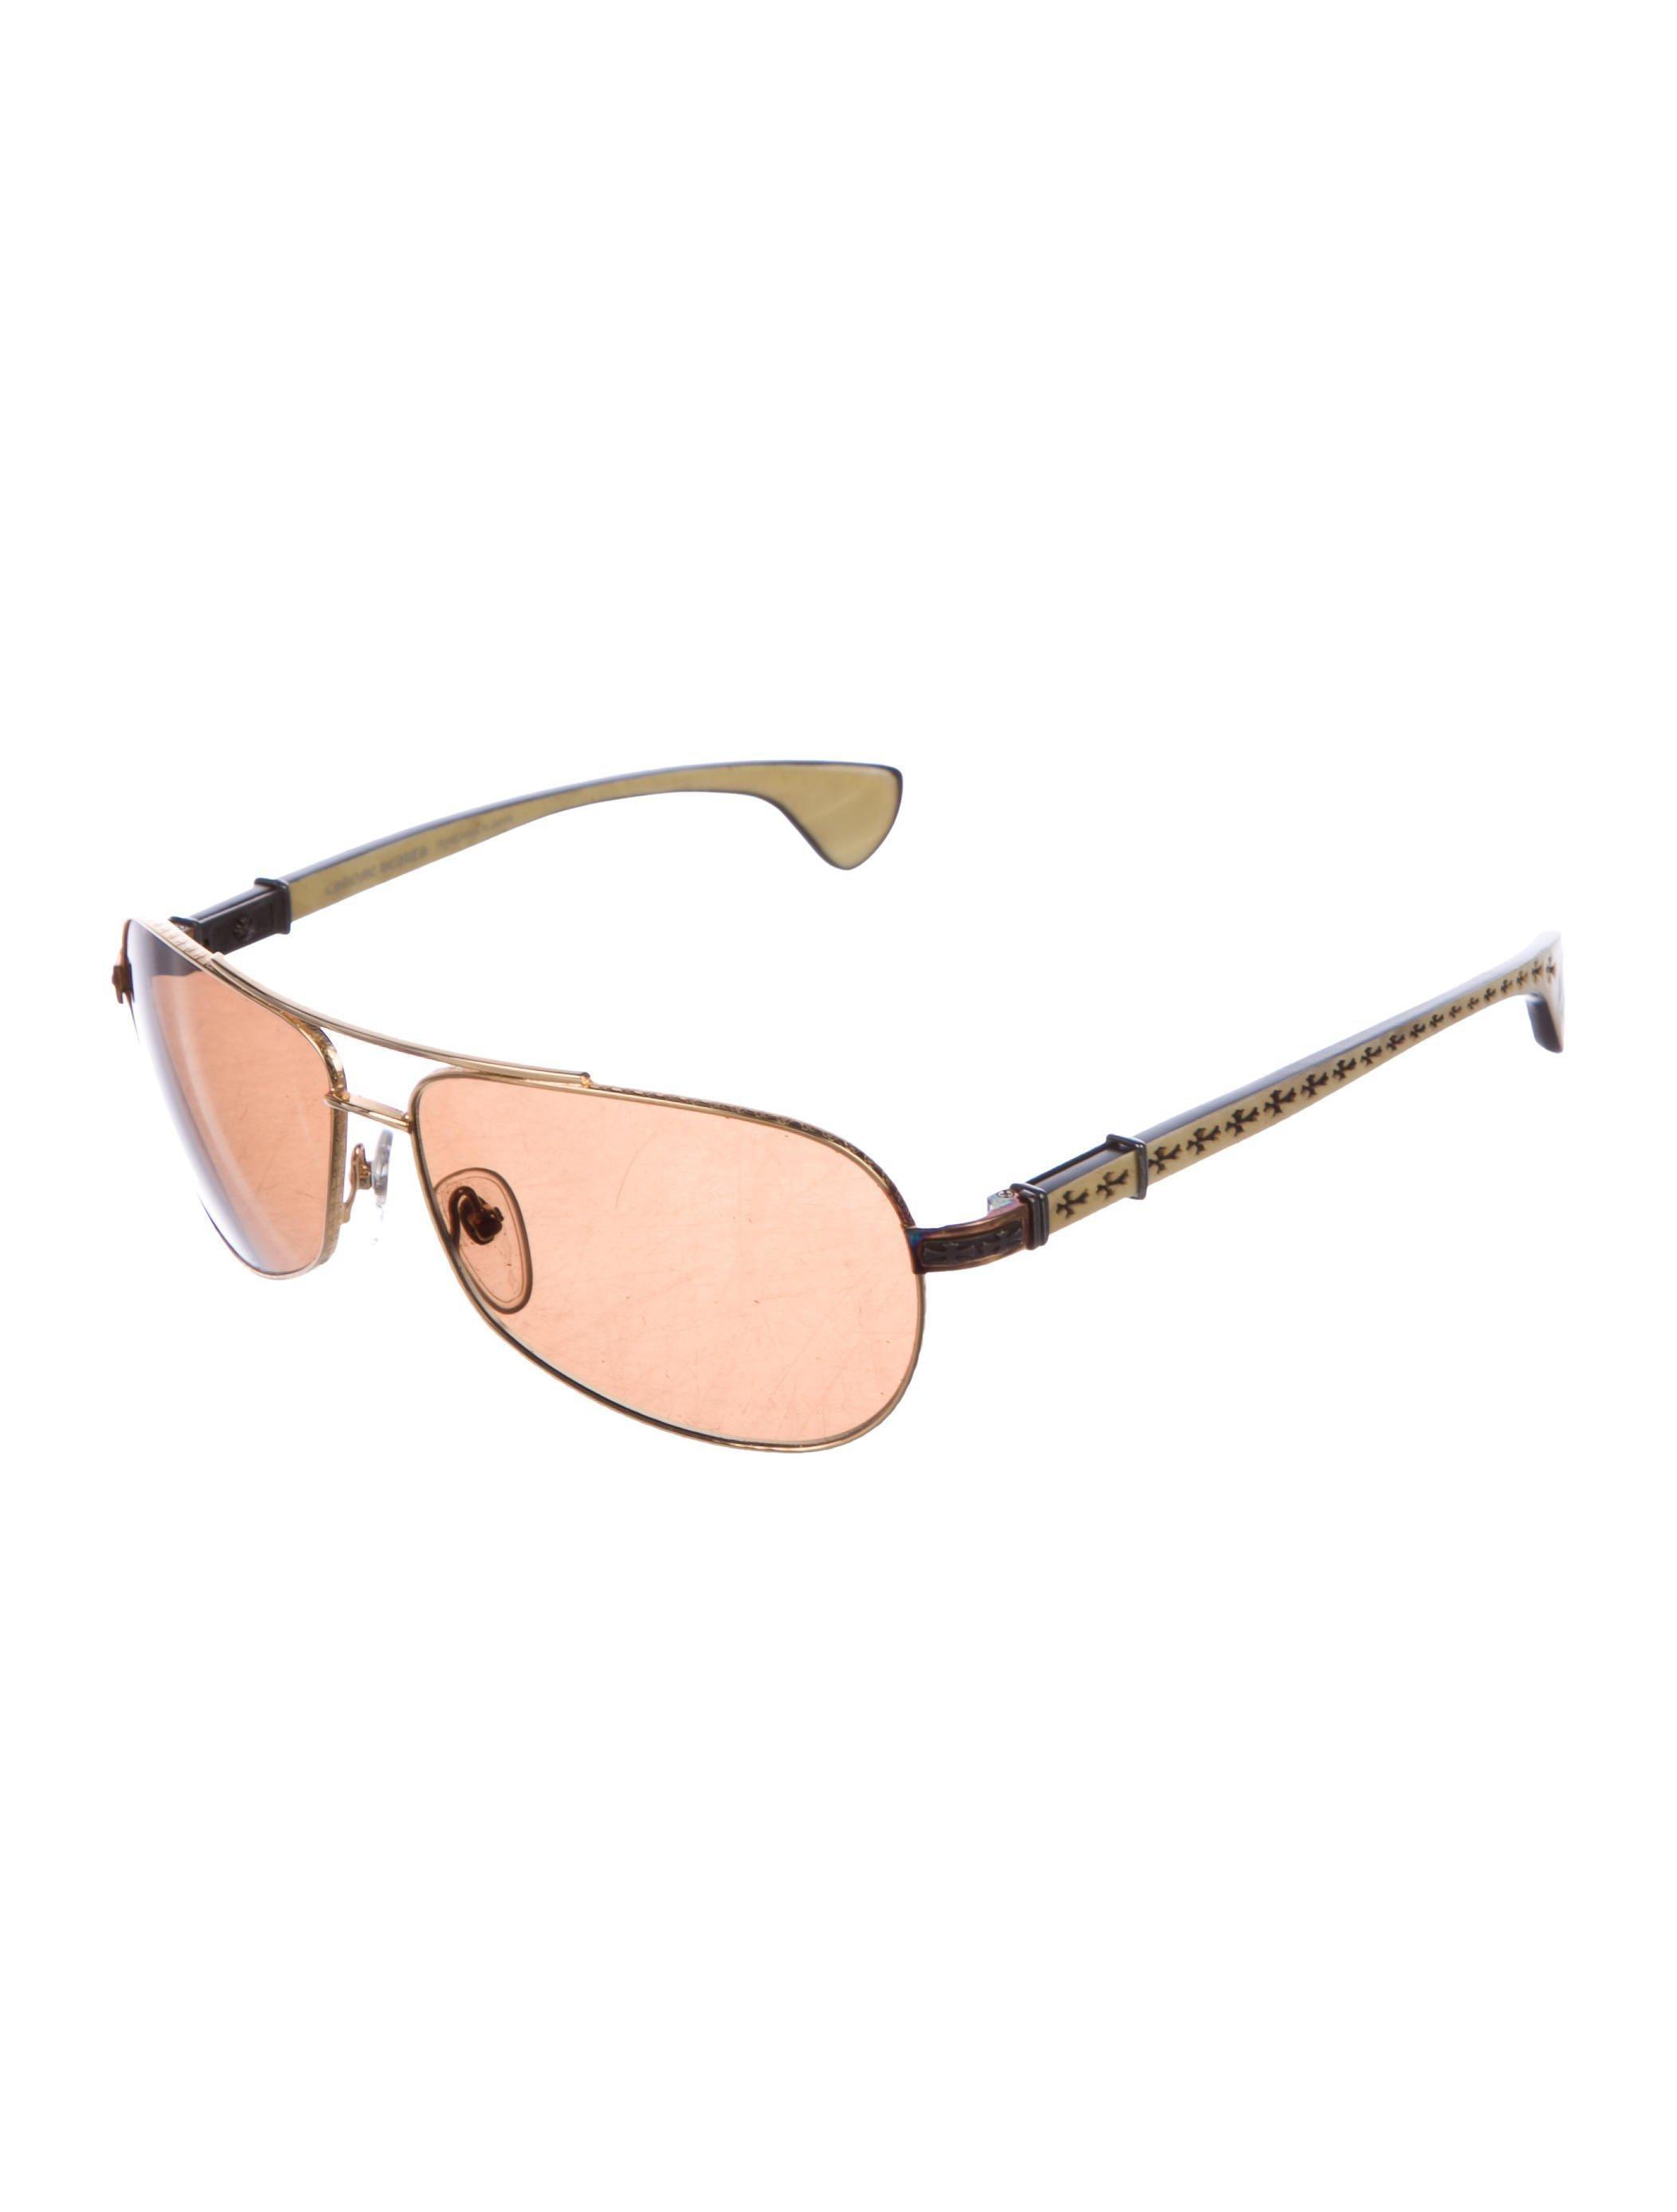 52f00af33db Lyst chrome hearts the beast aviator sunglasses gold in metallic jpg  2105x2776 Beast sunglasses chrome hearts